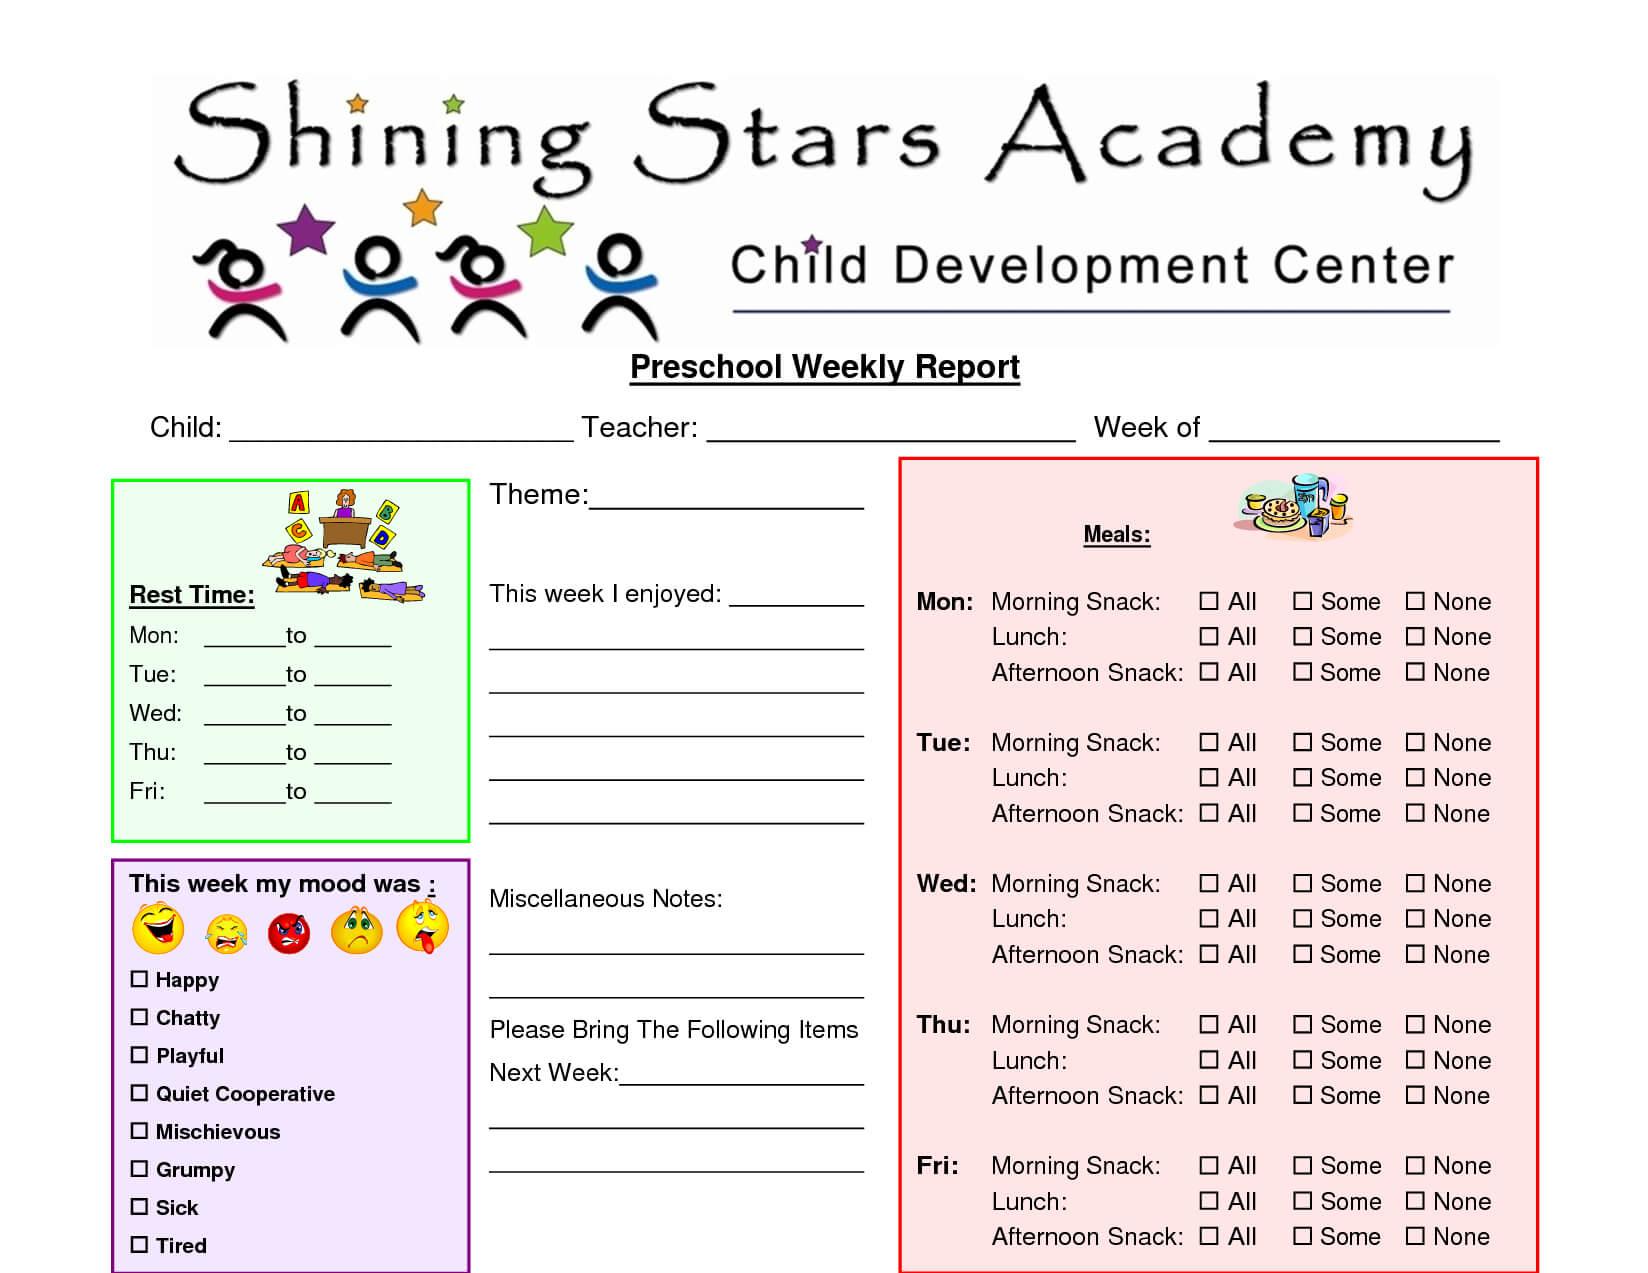 Preschool+Printable+Weekly+Progress+Reports+John+Blog Throughout Preschool Weekly Report Template